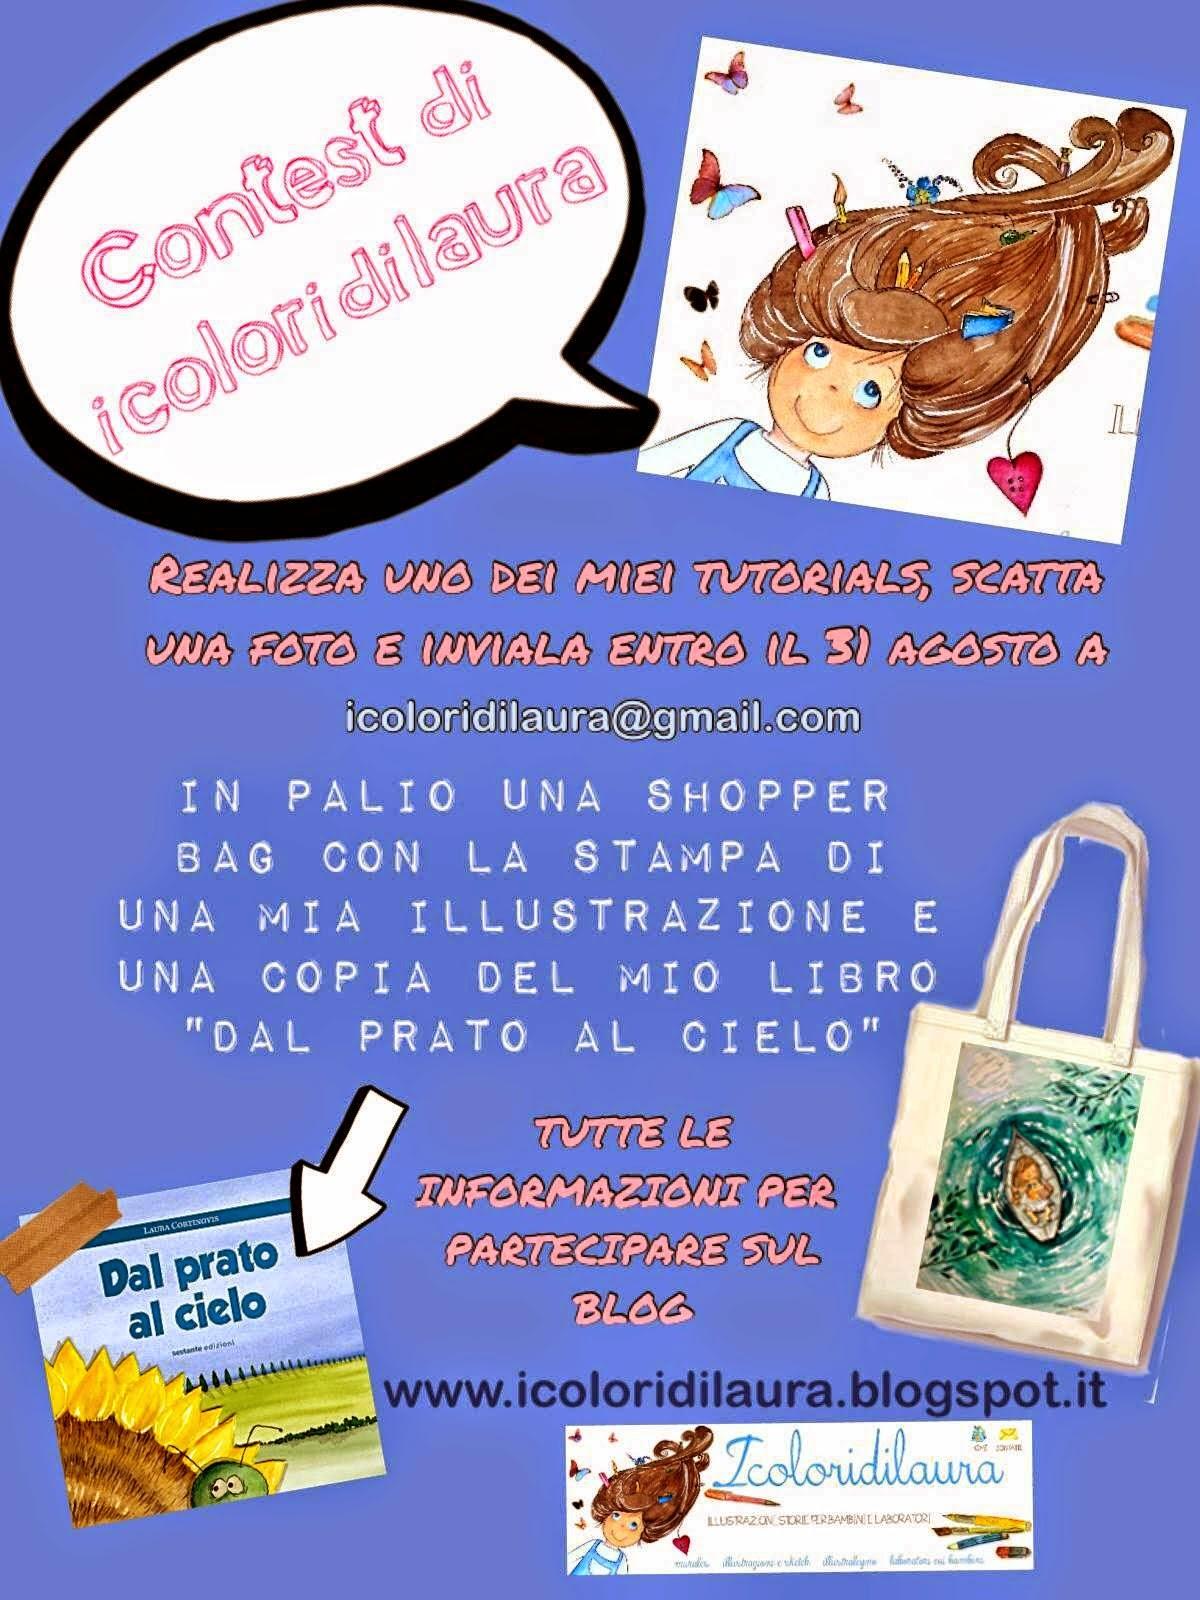 http://www.icoloridilaura.blogspot.it/